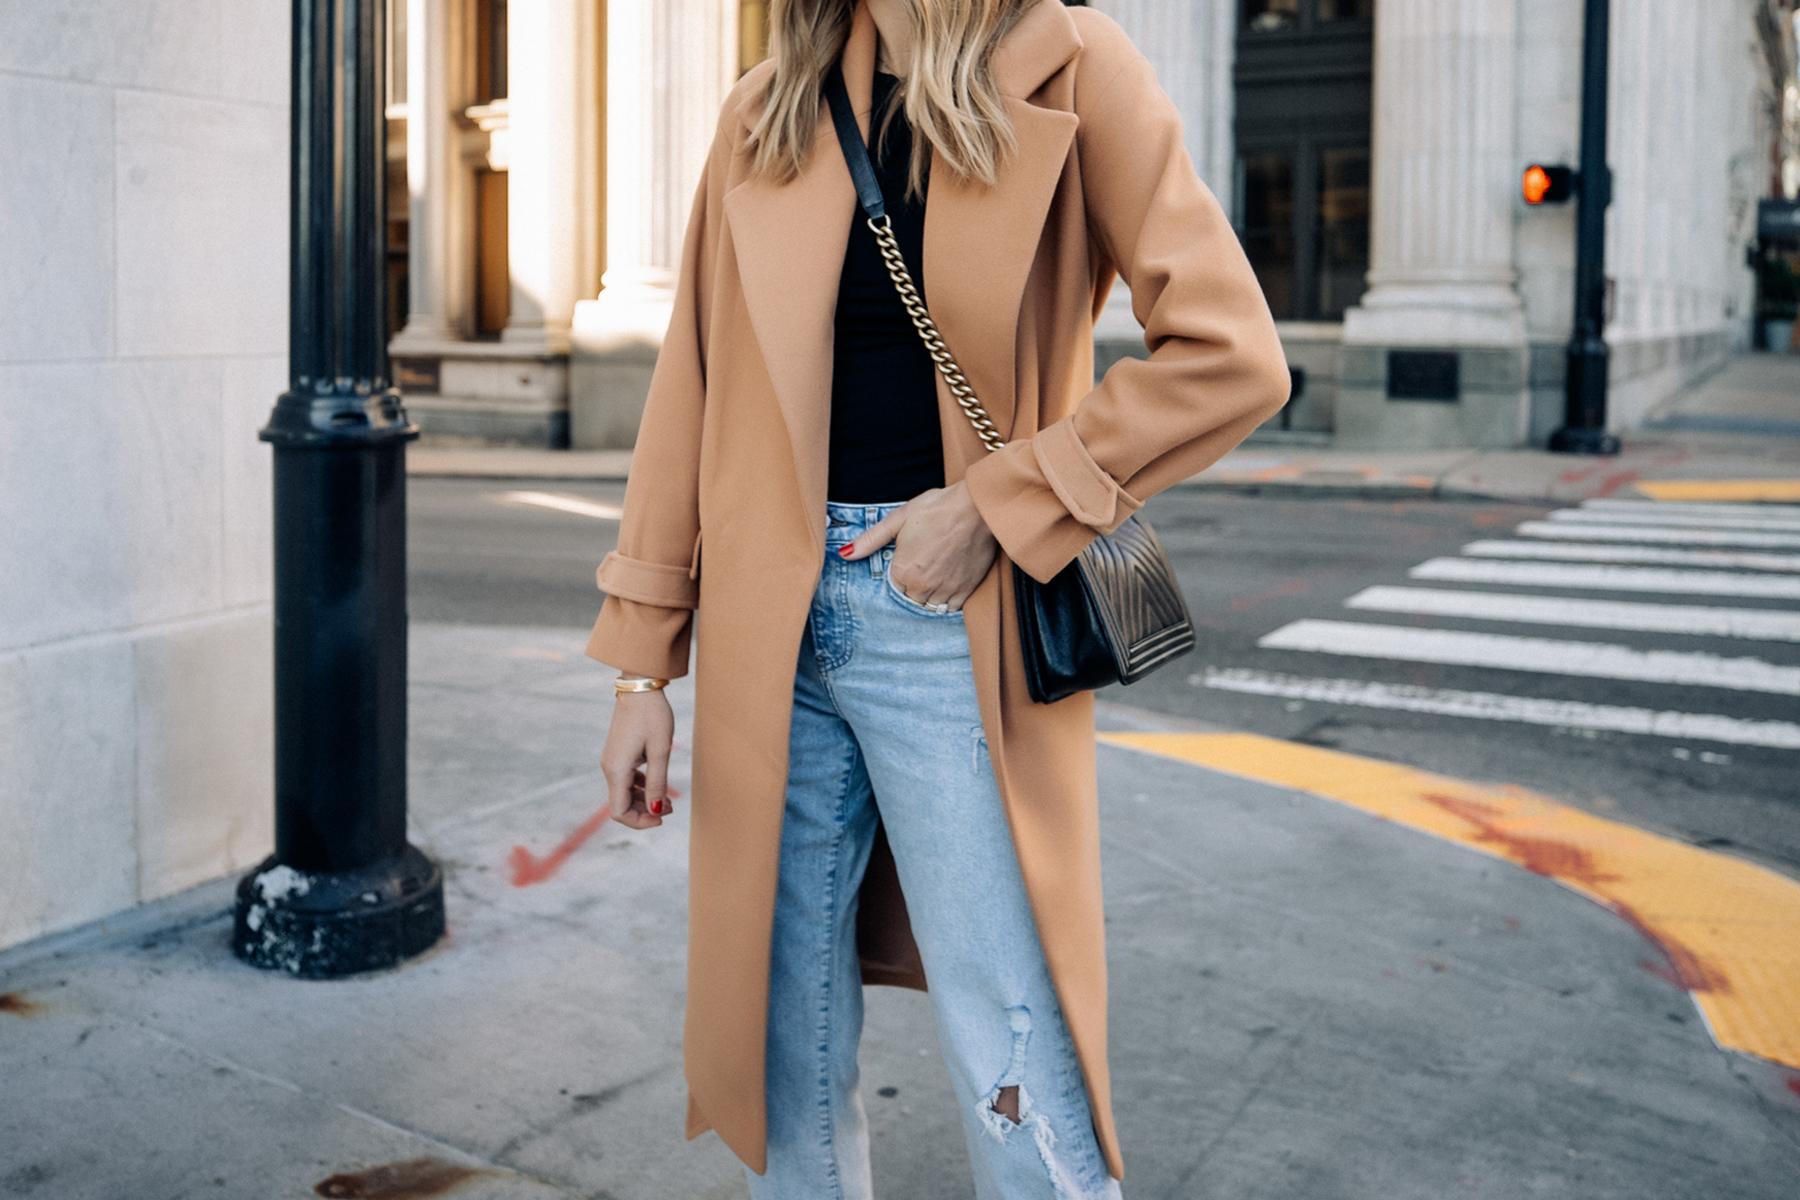 Fashion Jackson Wearing Express Camel Coat Black Tee Ripped Jeans Black Handbag Fall Outfit